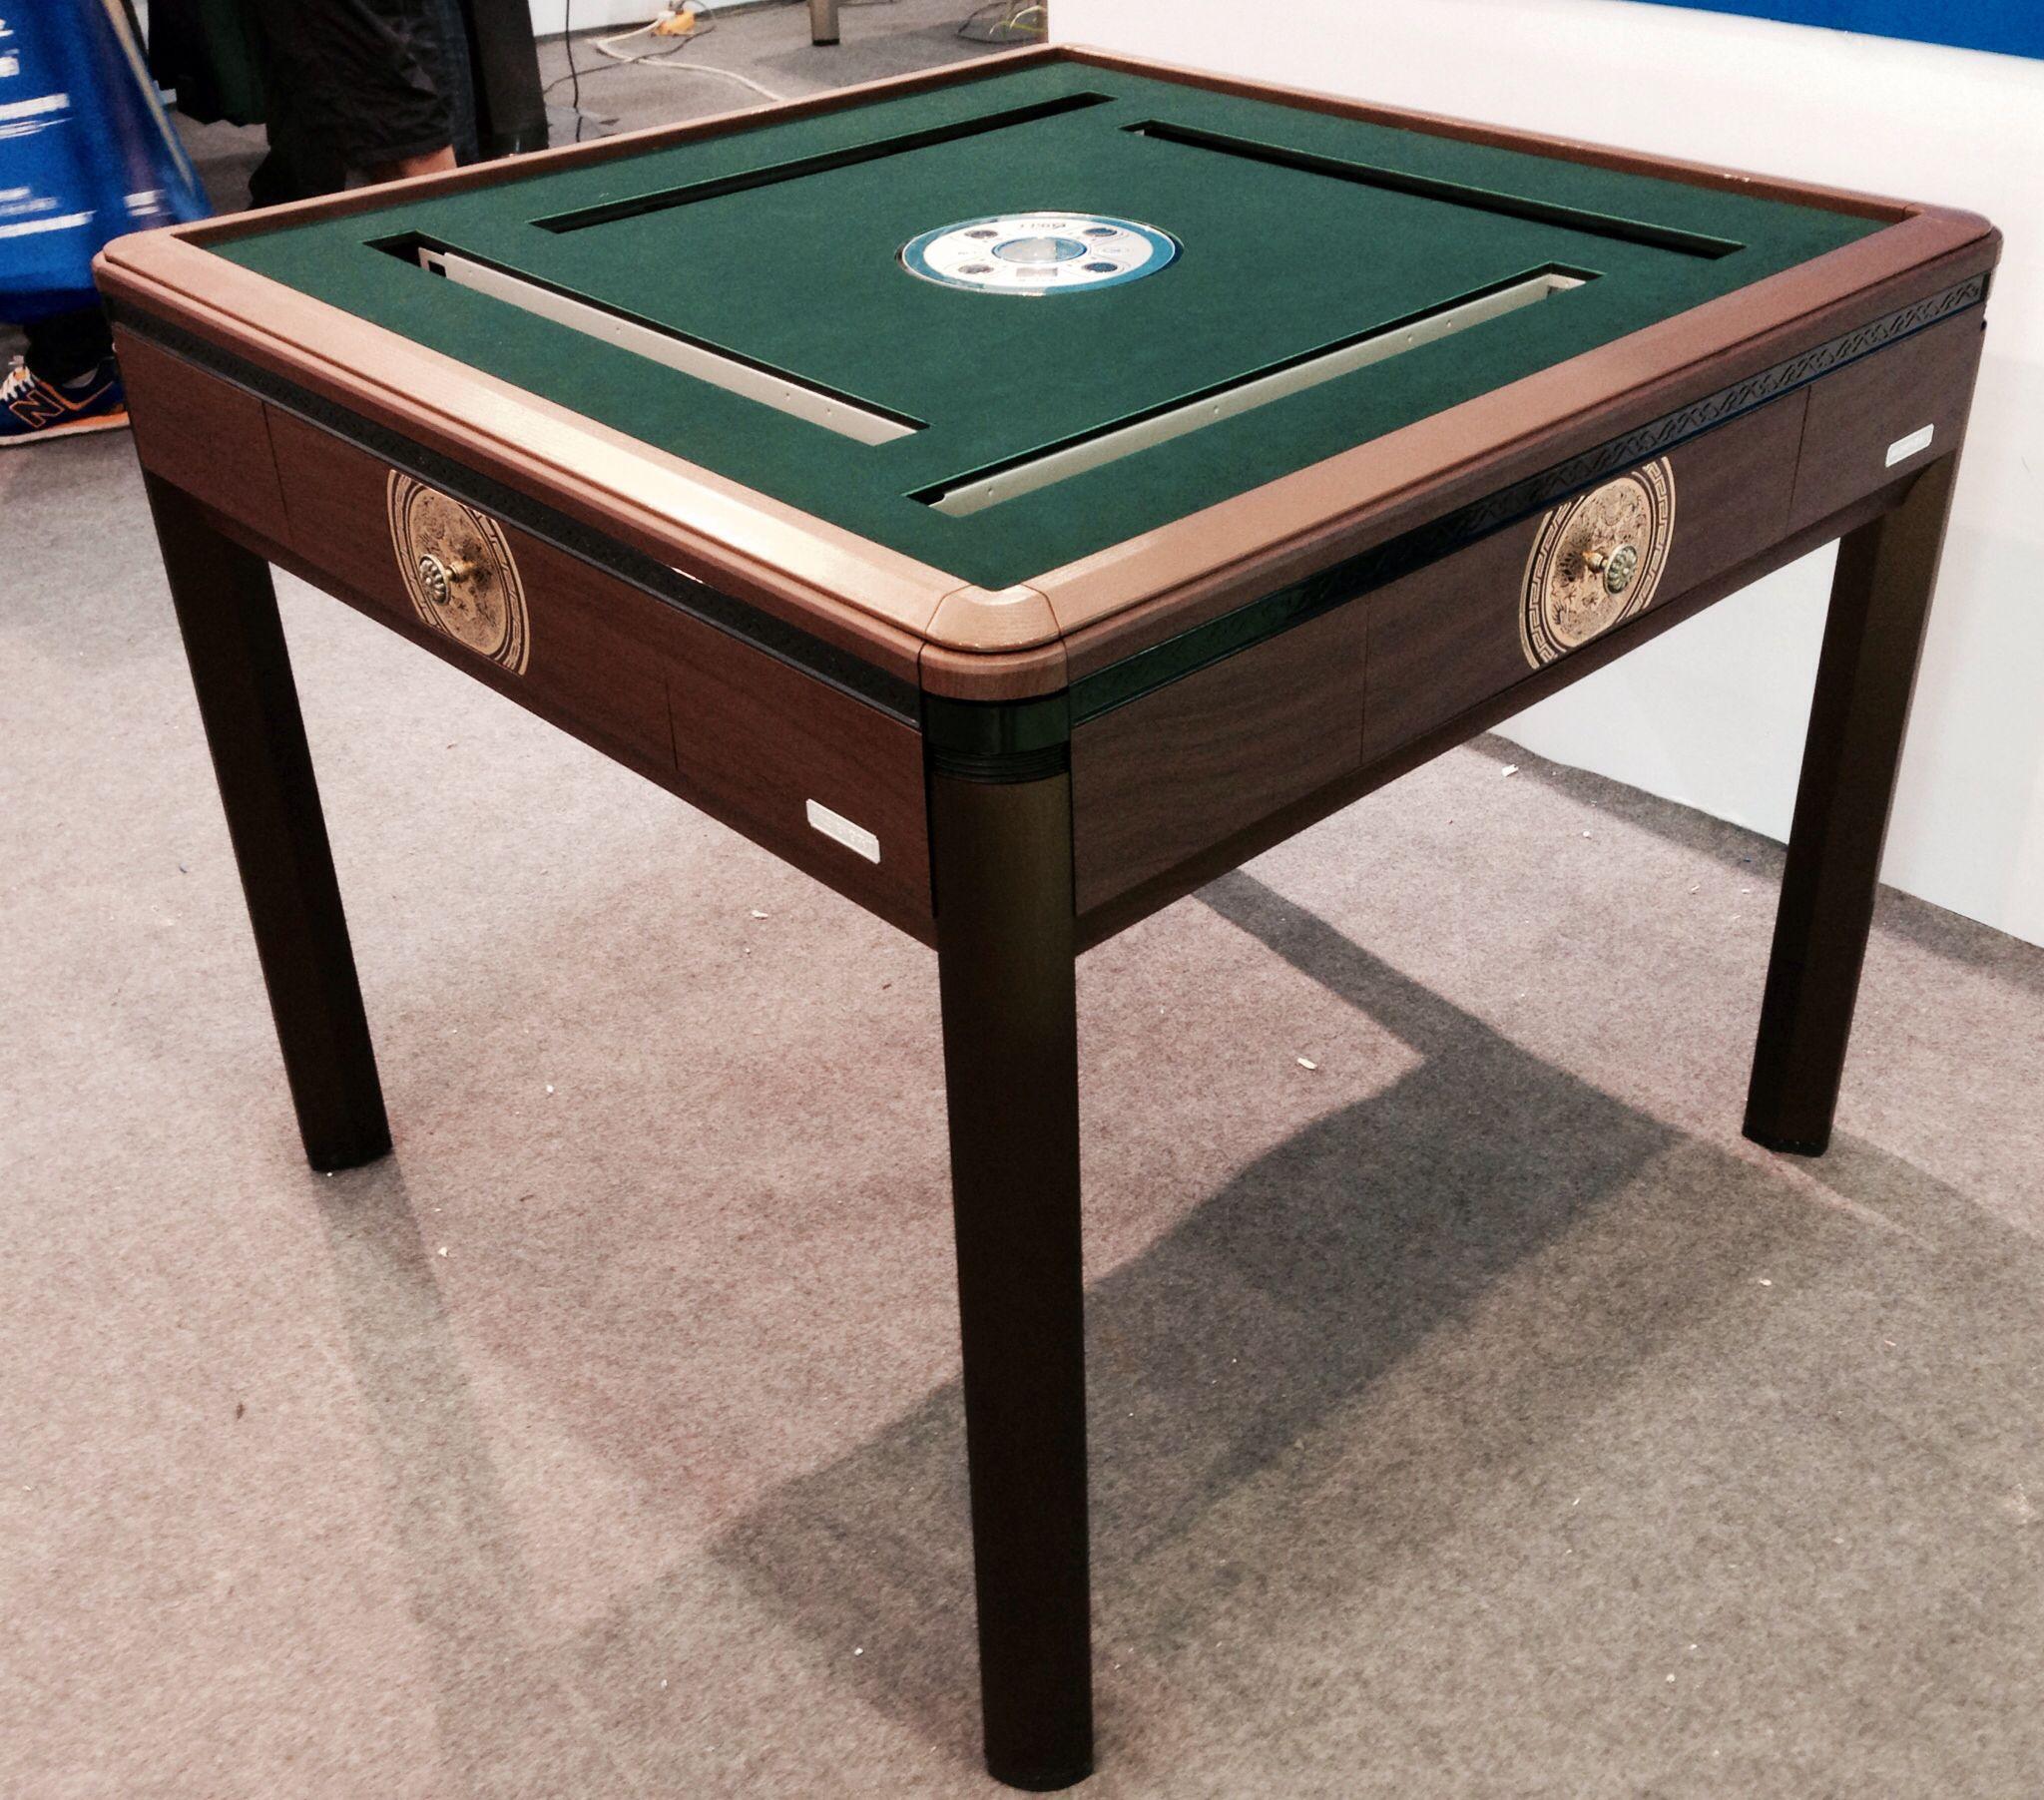 New design automatic mahjong tabel Mahjong table